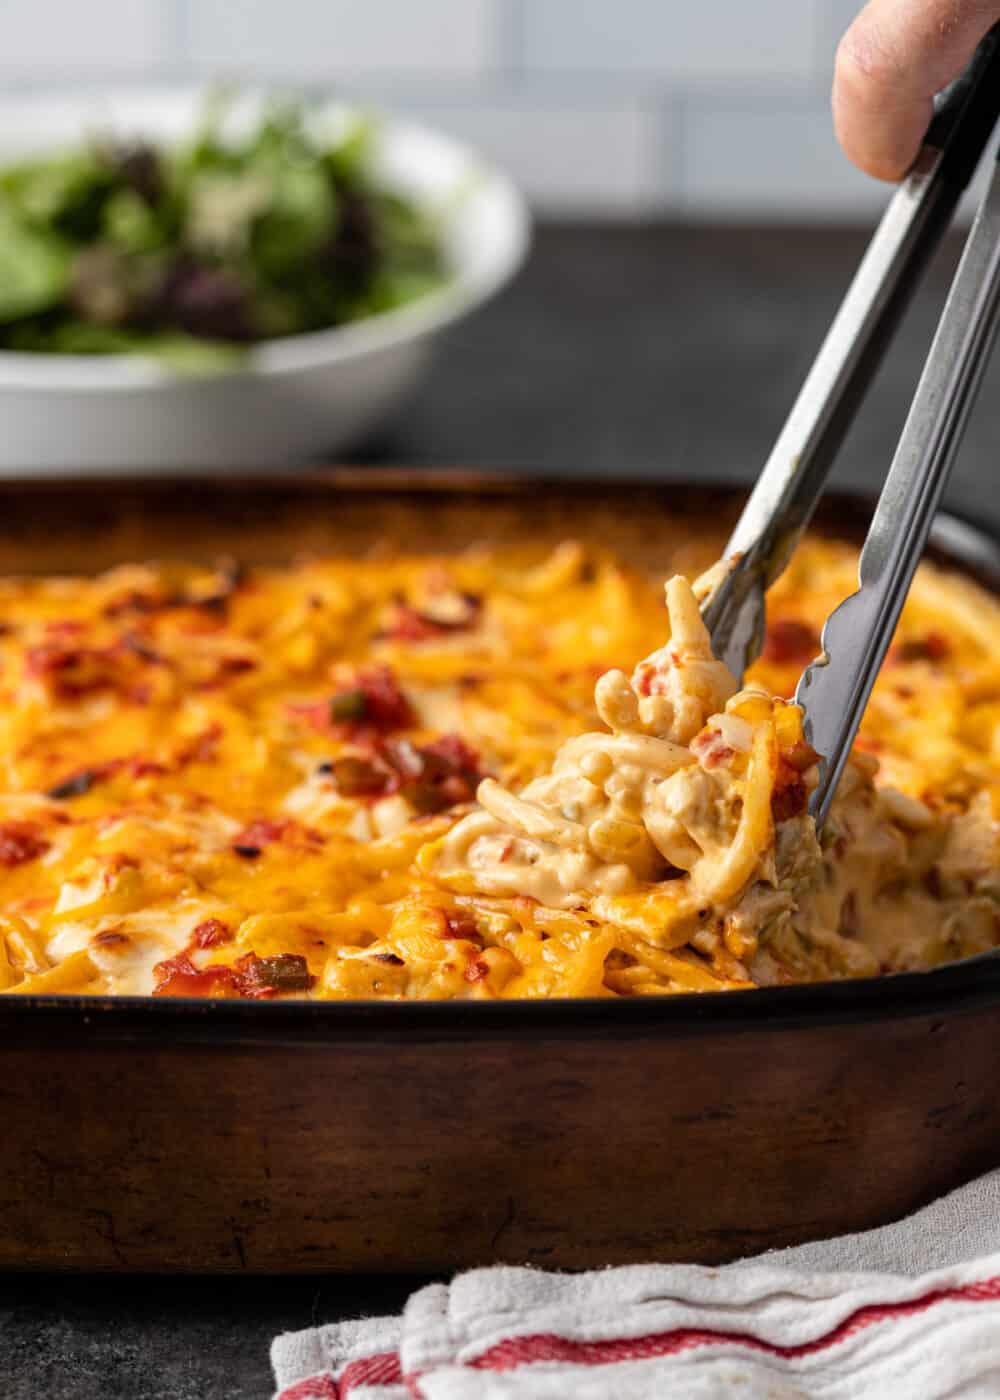 using tongs to serve chicken spaghetti casserole